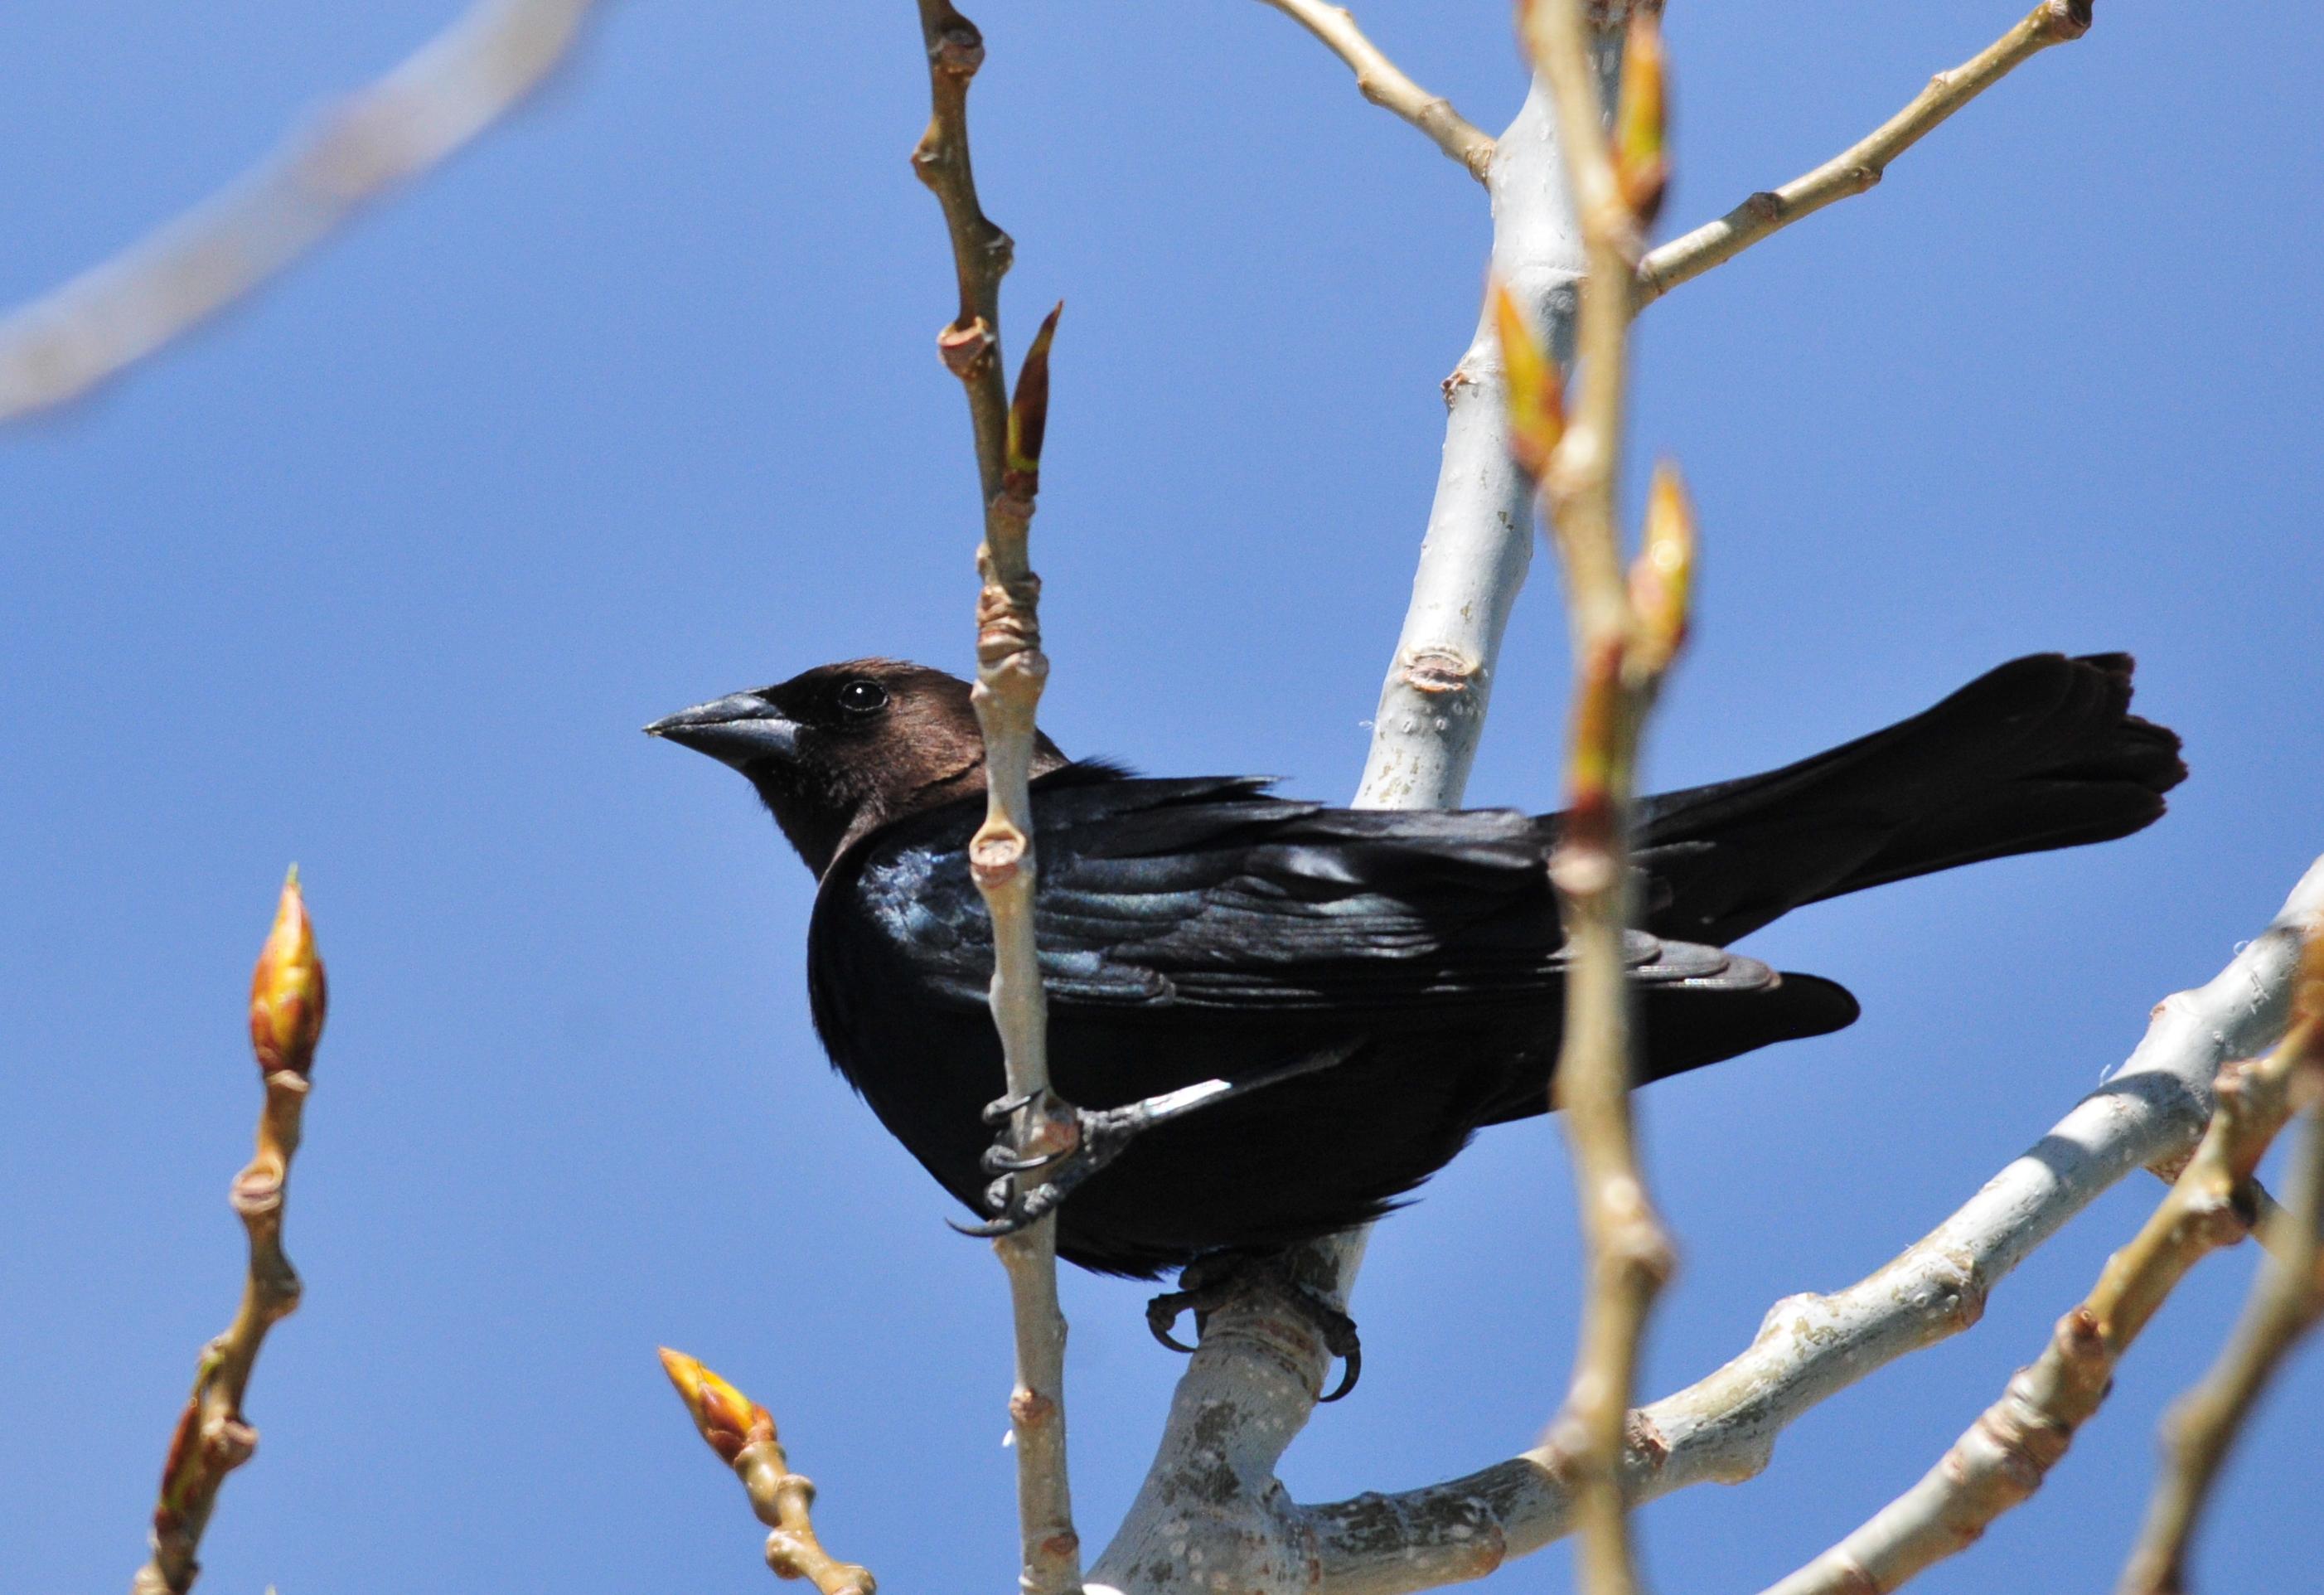 Brown_Headed_Cowbird_on_Seedskadee_National_Wildlife_Refuge_USFWS